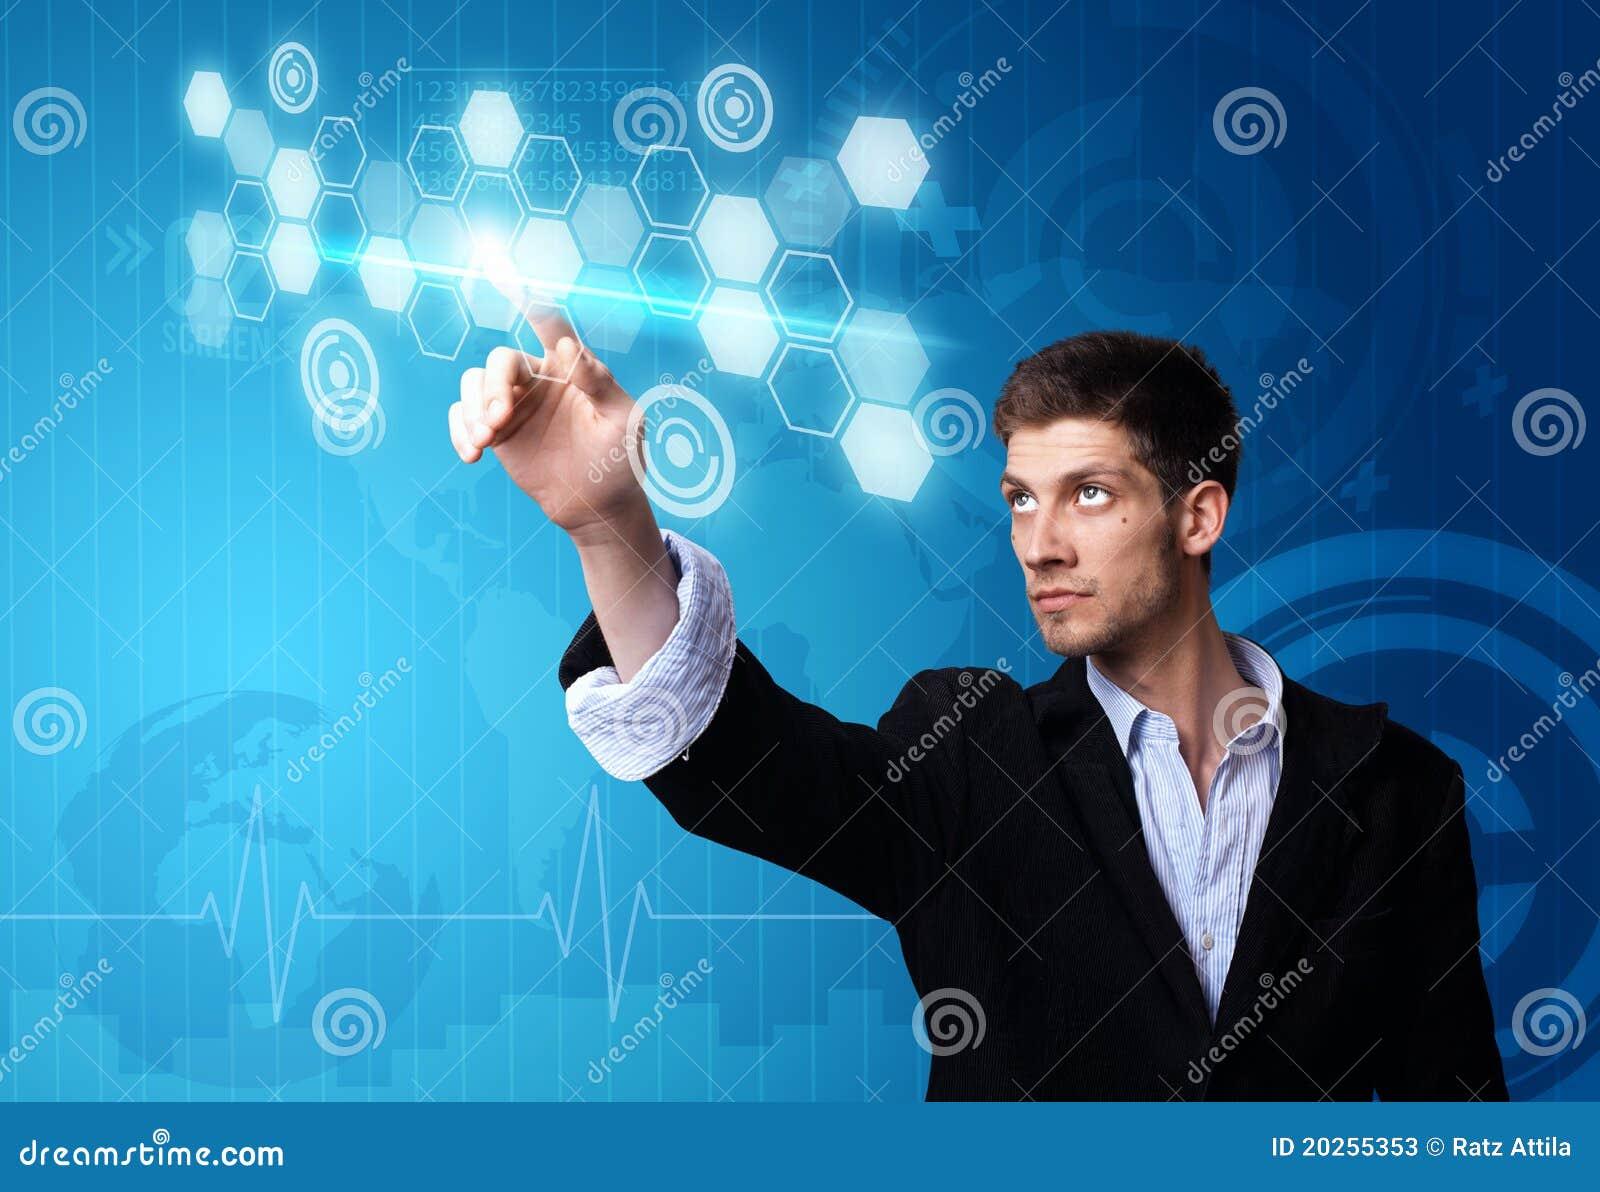 Businessman working on modern technology